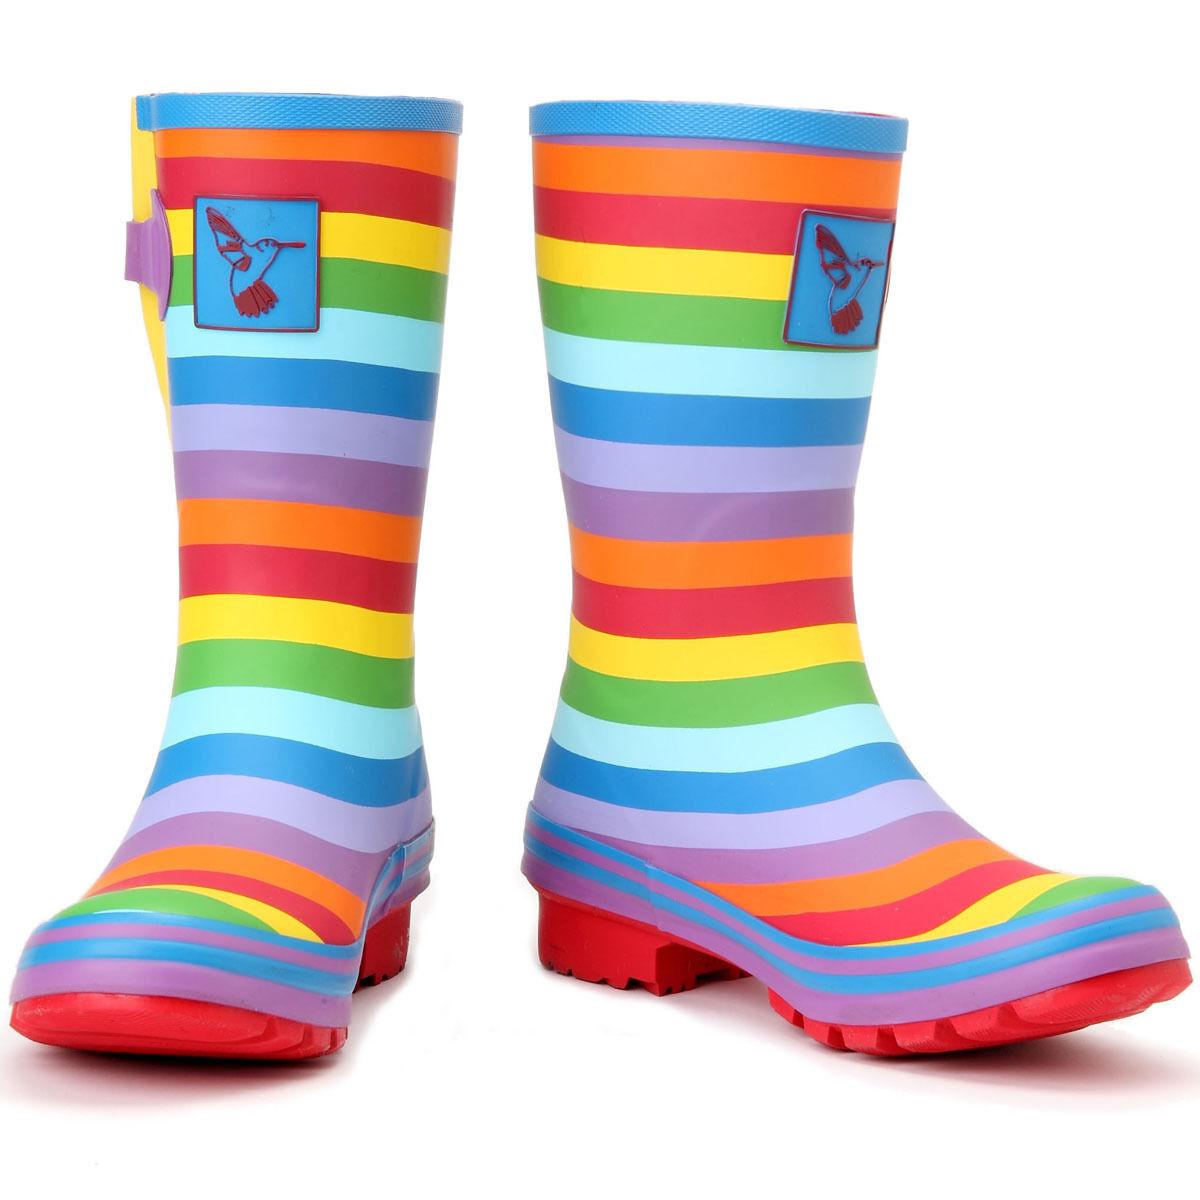 Evercreatures UK Brand Rainbow Rubber Rain Boots Wellington boot for women